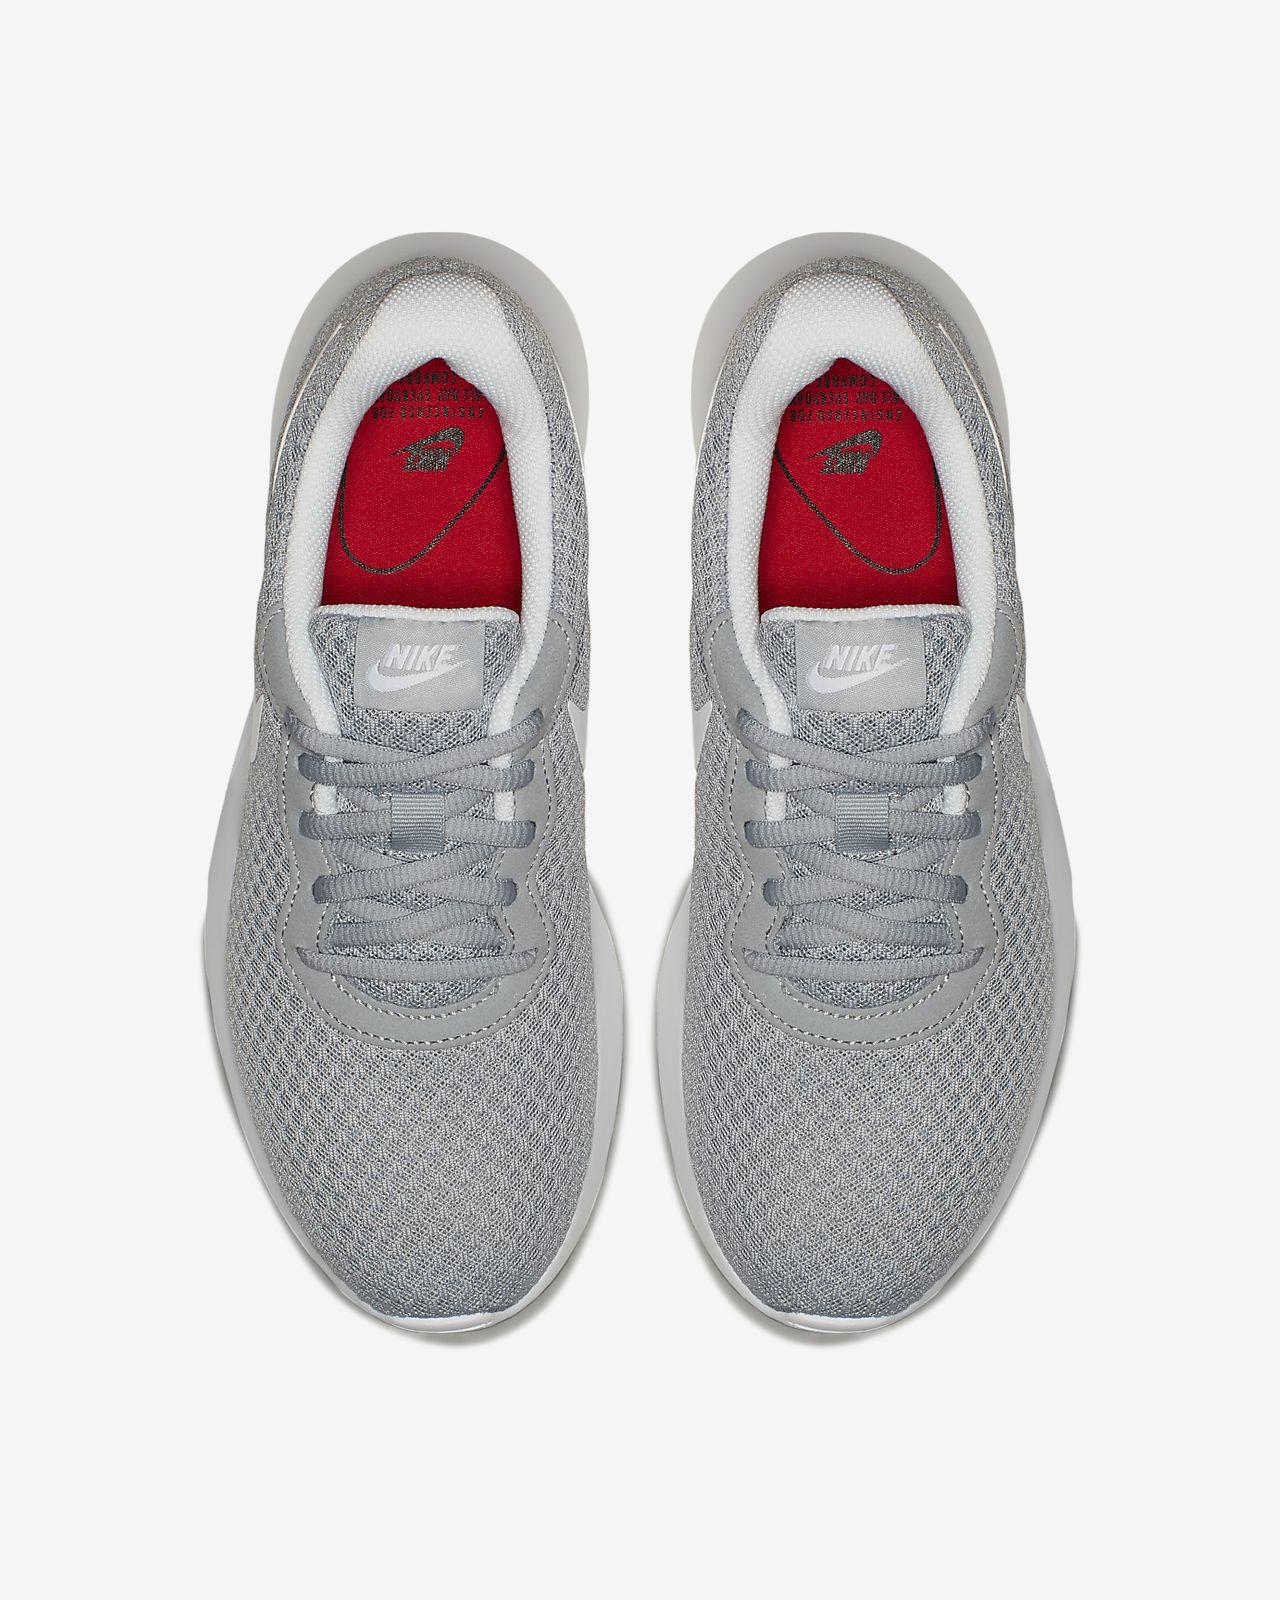 best loved b0912 d0f77 ... Chaussure Nike Tanjun pour Femme